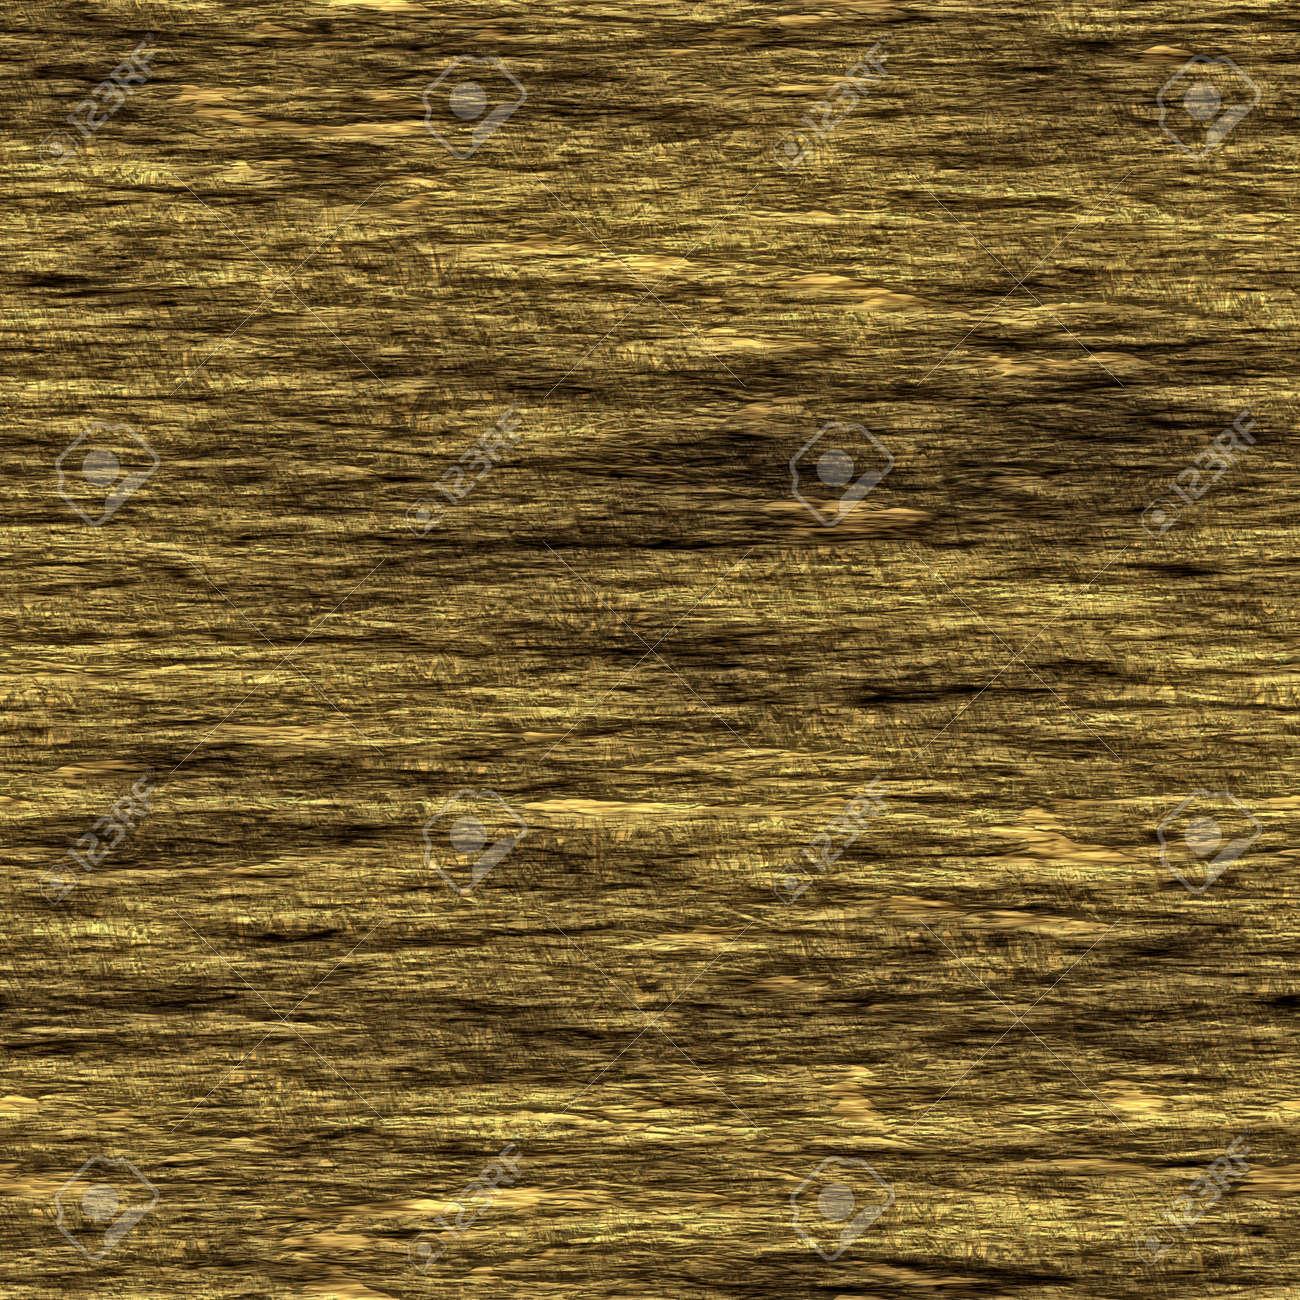 rough wood seamless texture tile stock photo 14256056